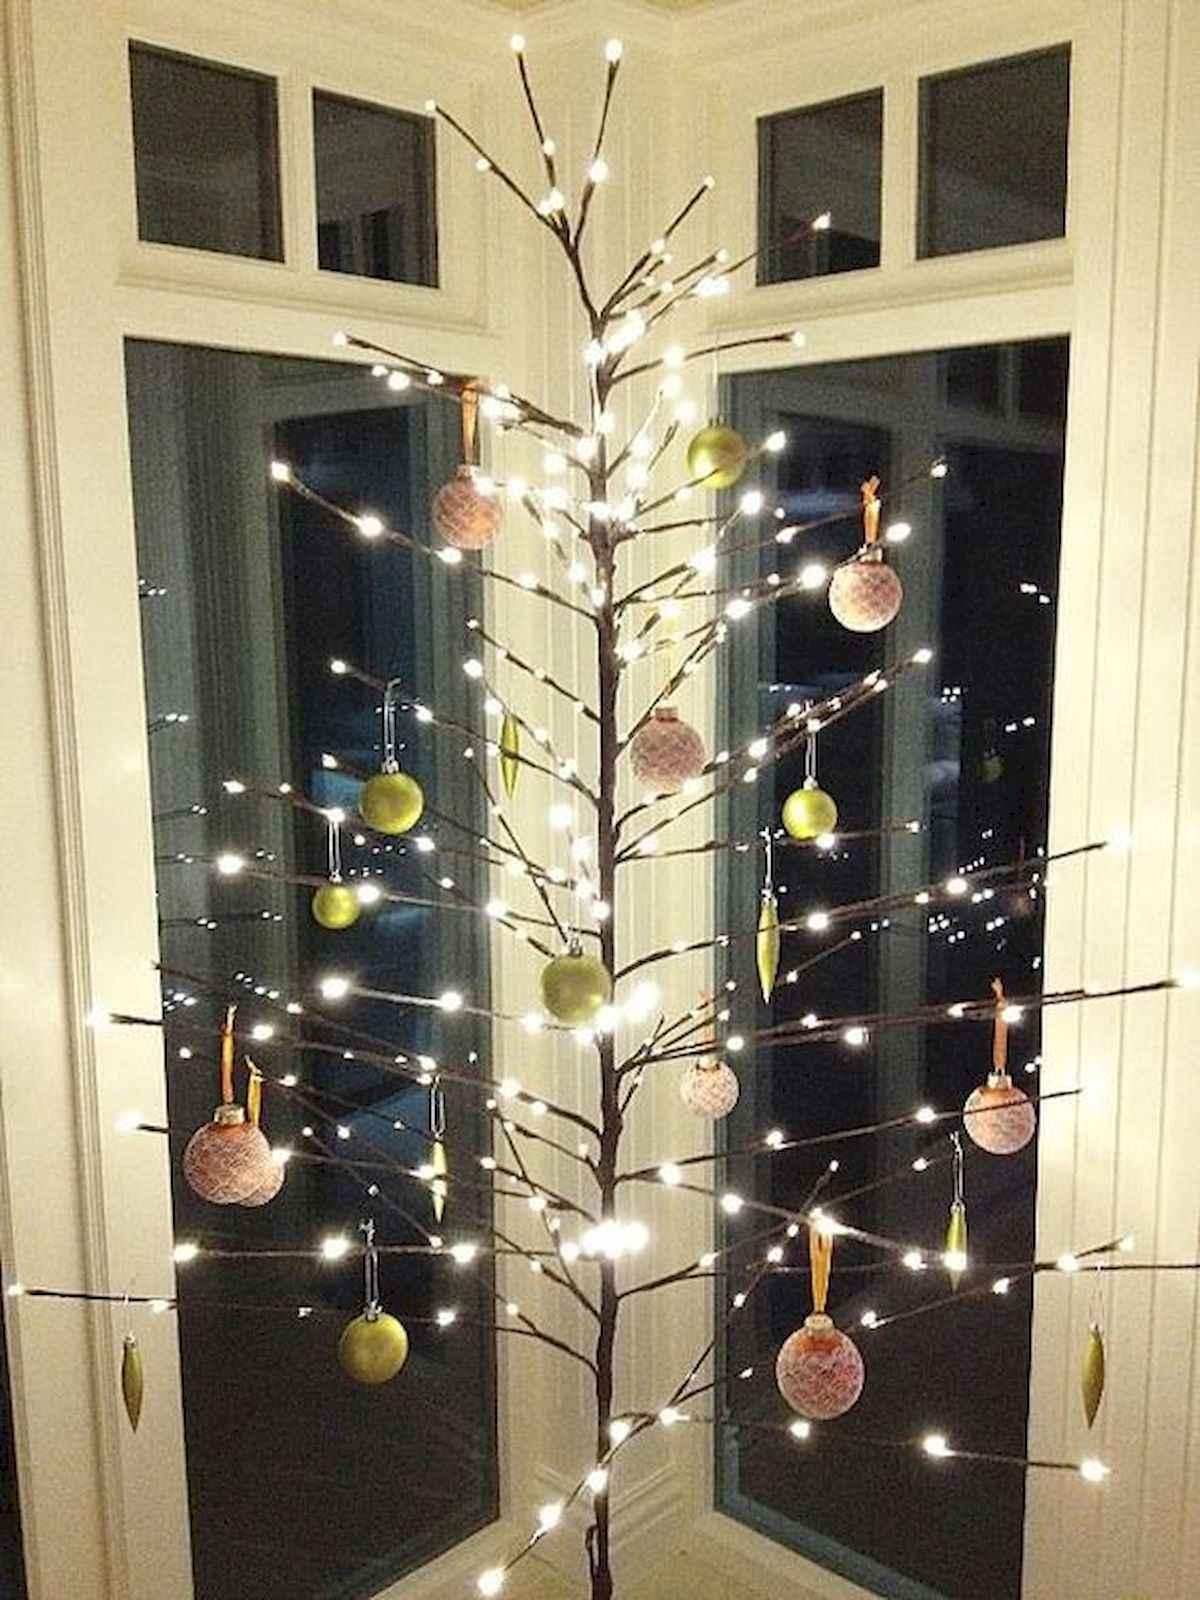 40 unique christmas tree ideas decorations (28)